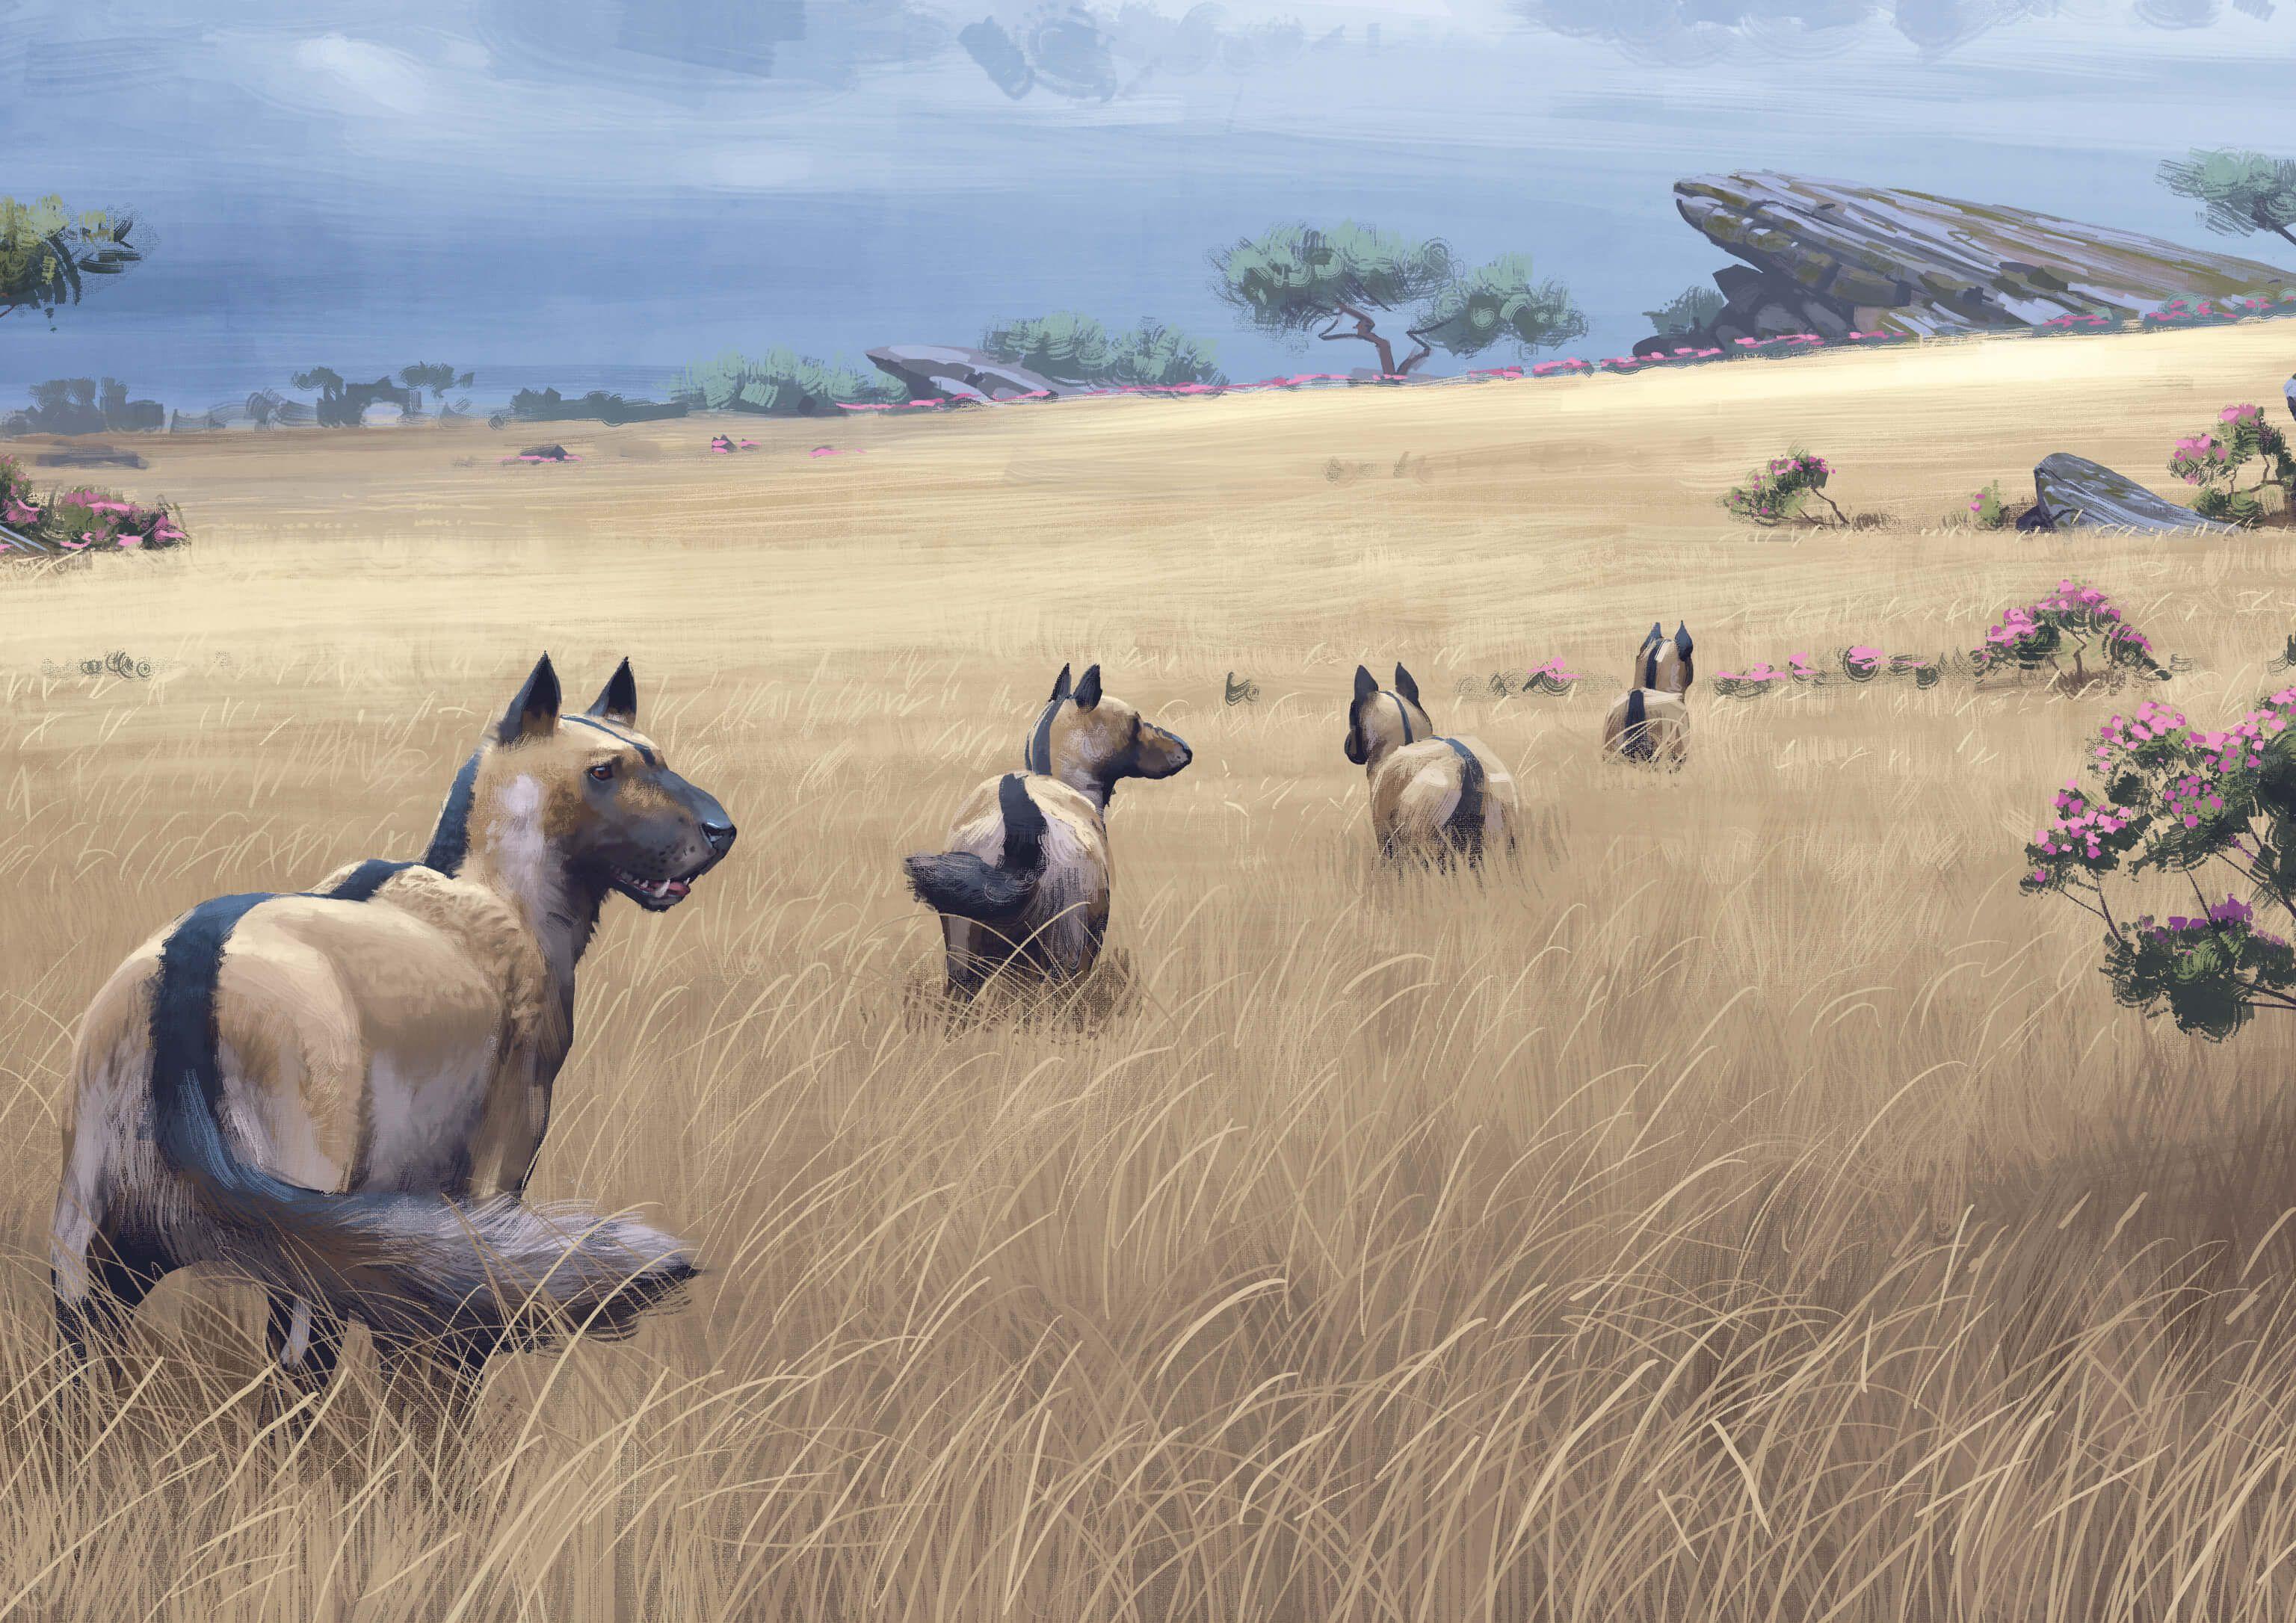 indian rhinoceros Hľadať Googlom (With images